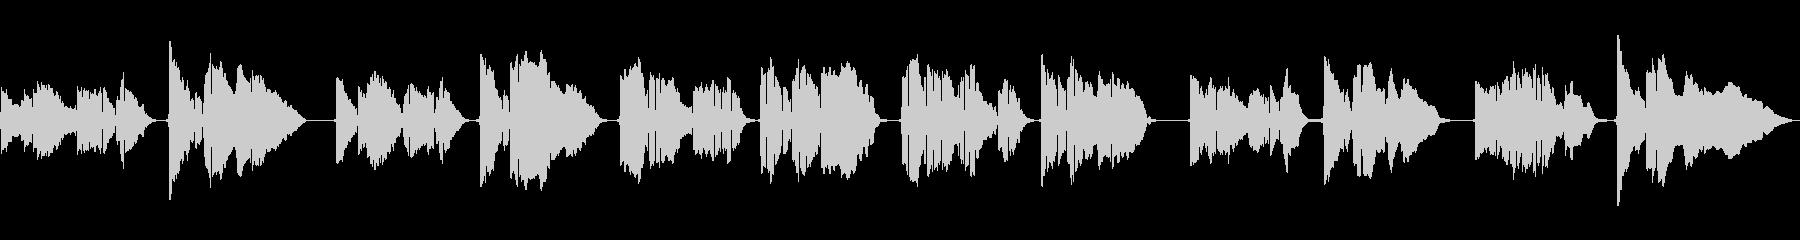 SAXのソロ演奏 抒情詩のようなメロの未再生の波形